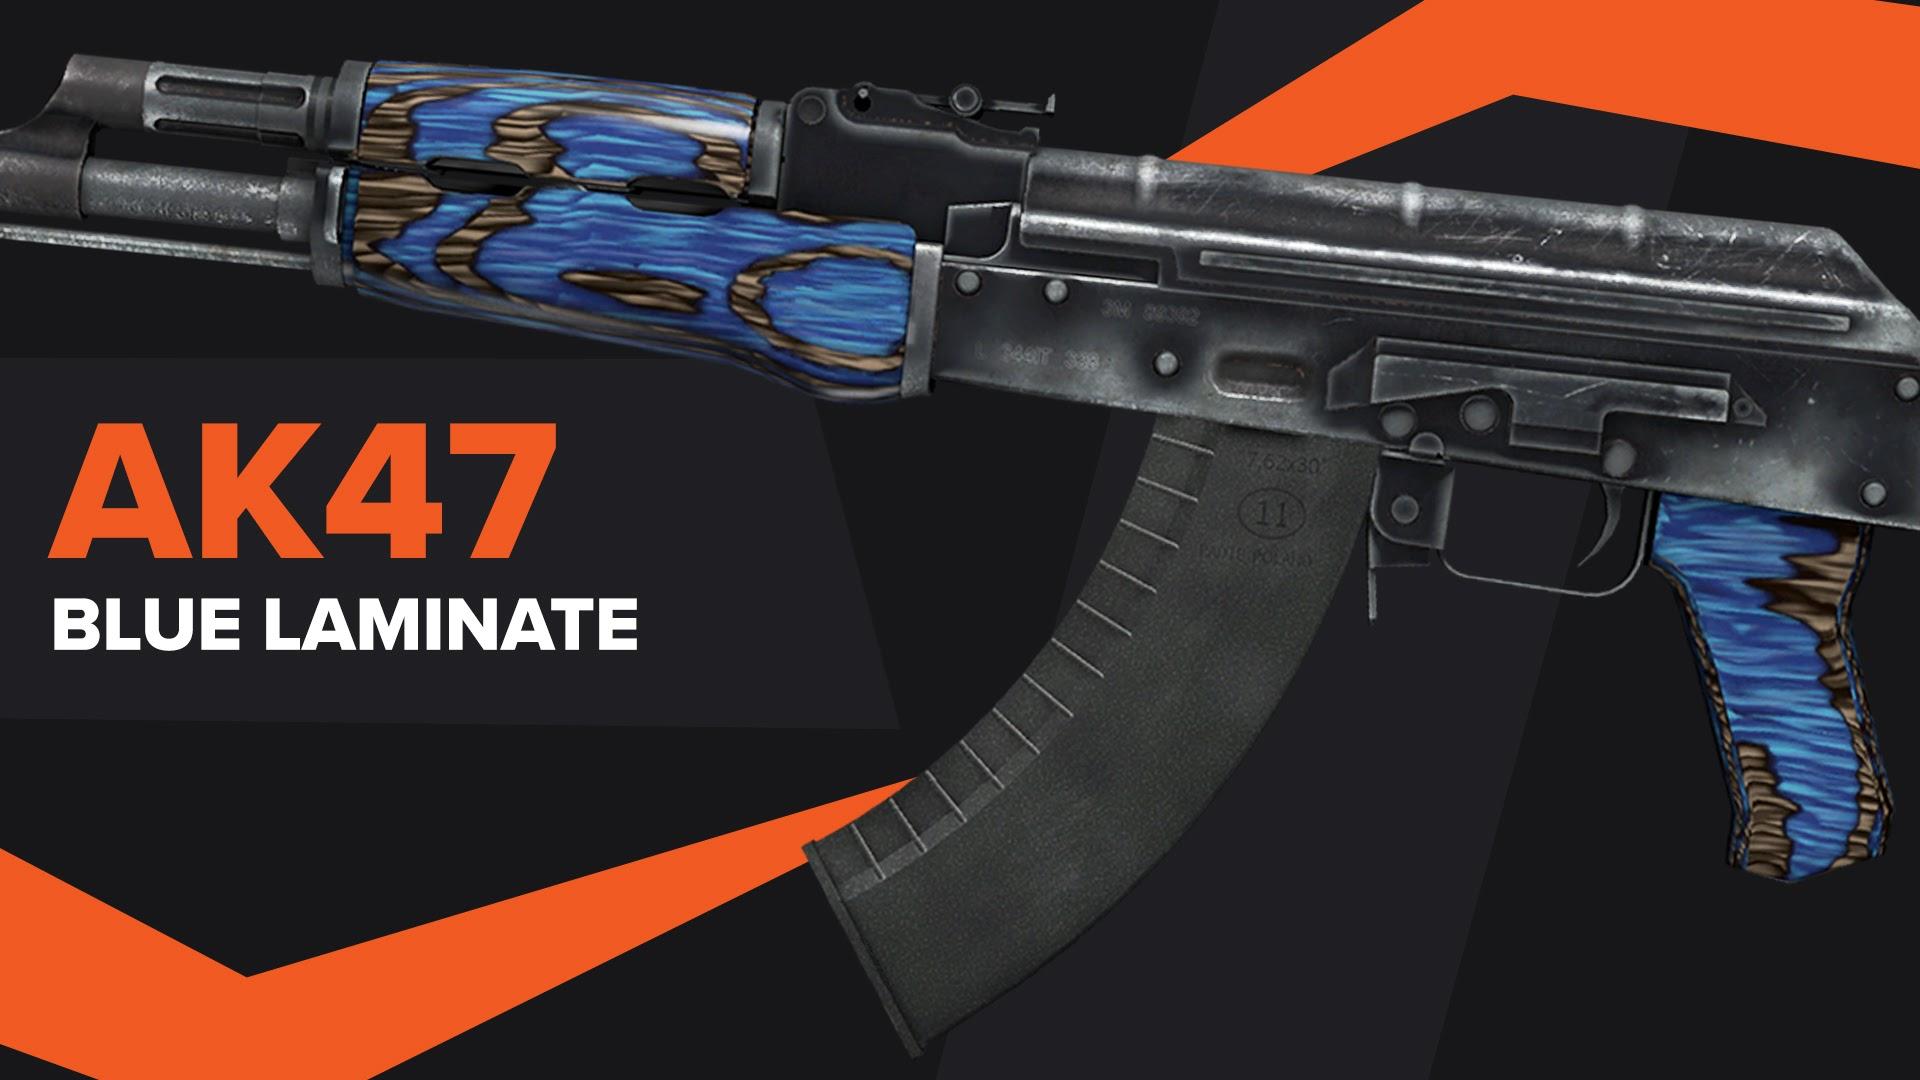 AK47 Blue Laminate CSGO Skin